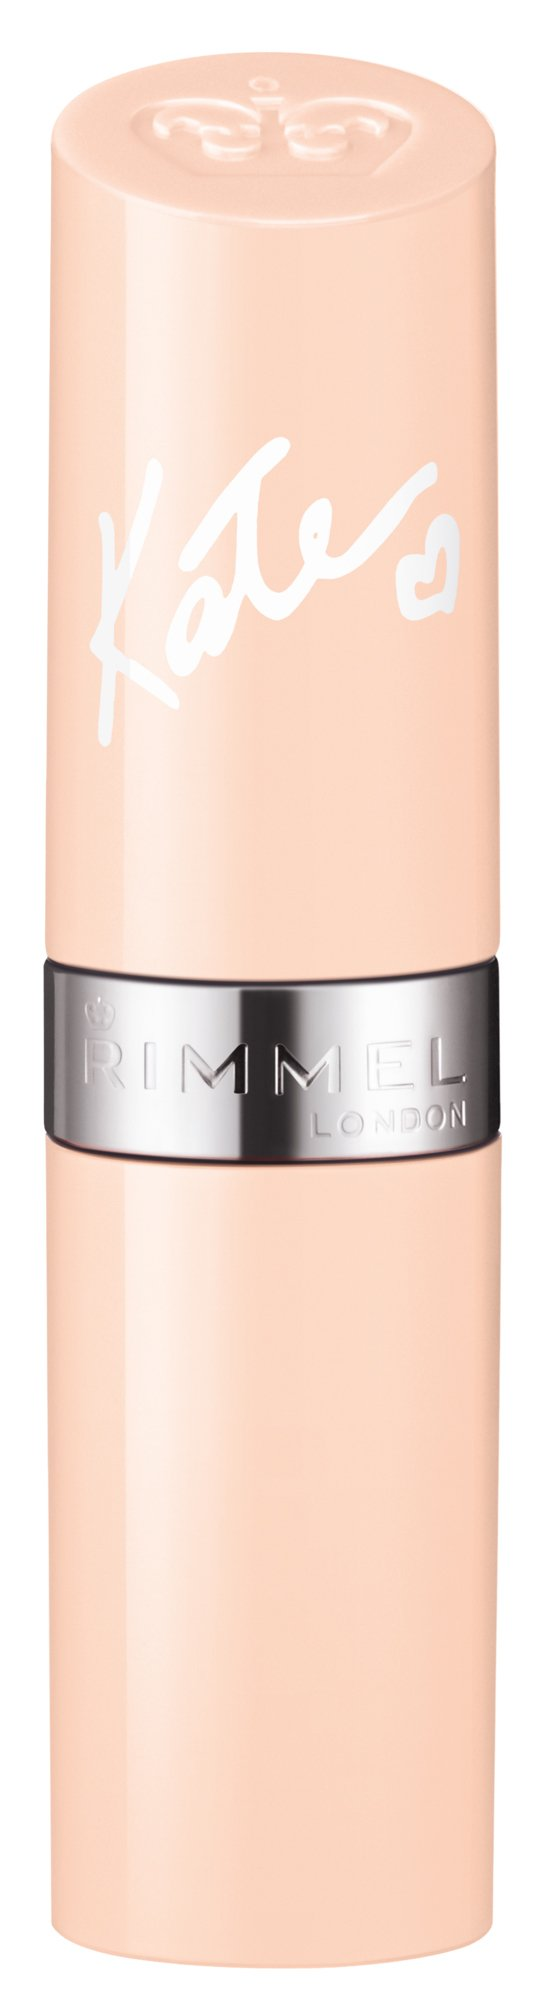 Rimmel-Kate Nude Lipstick-lipbalm-product shot-25AED